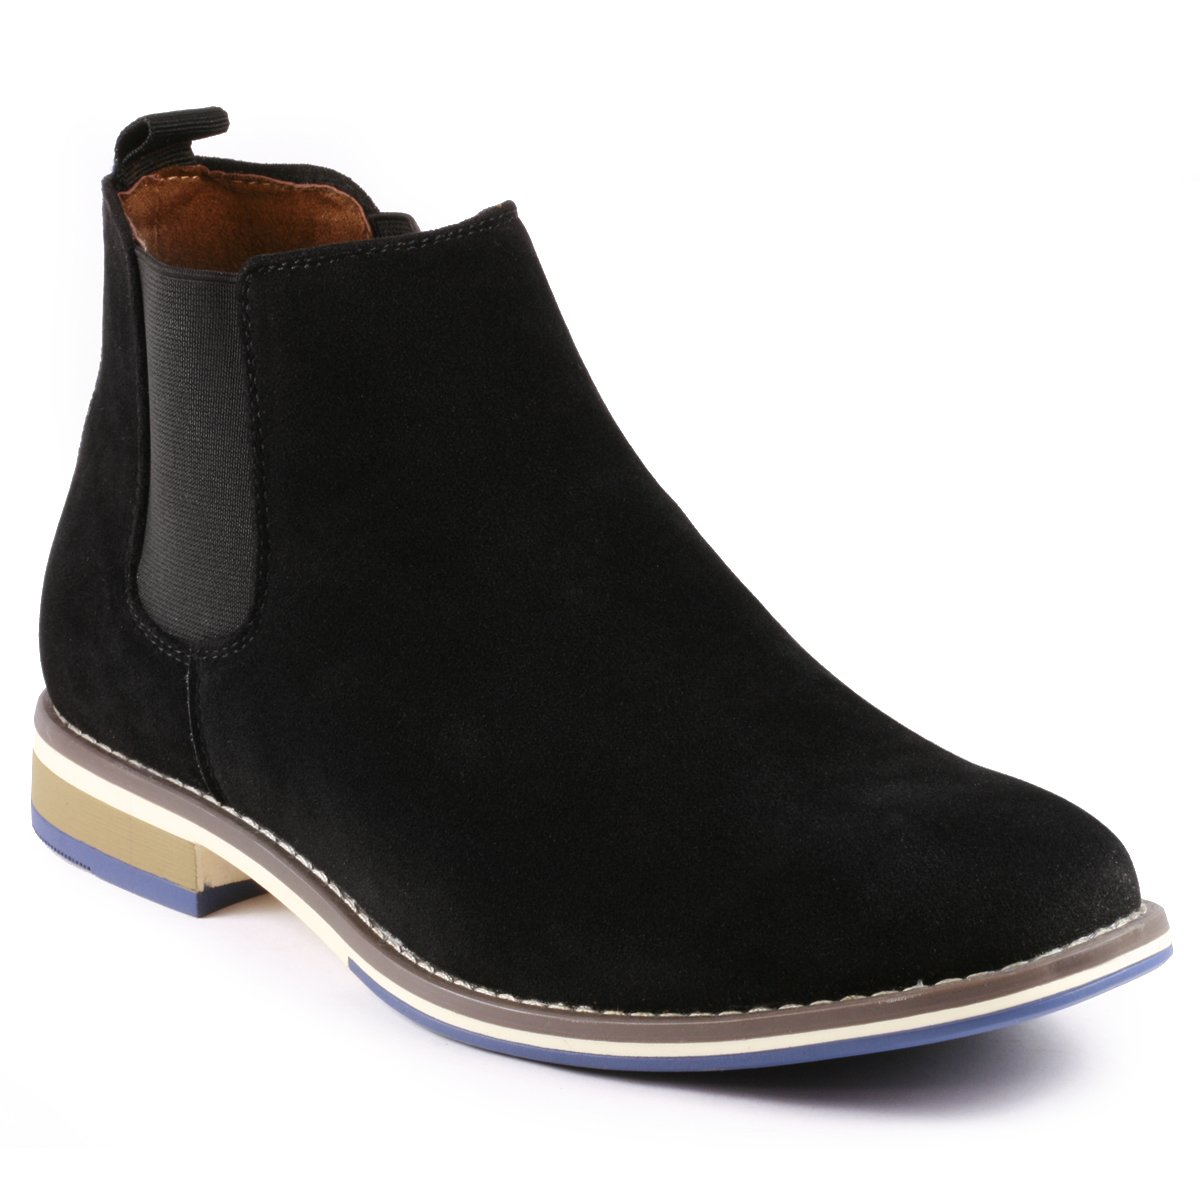 Metrocharm MC130 Men's Formal Dress Casual Ankle Chelsea Boot (7.5 D(M) US, Black)